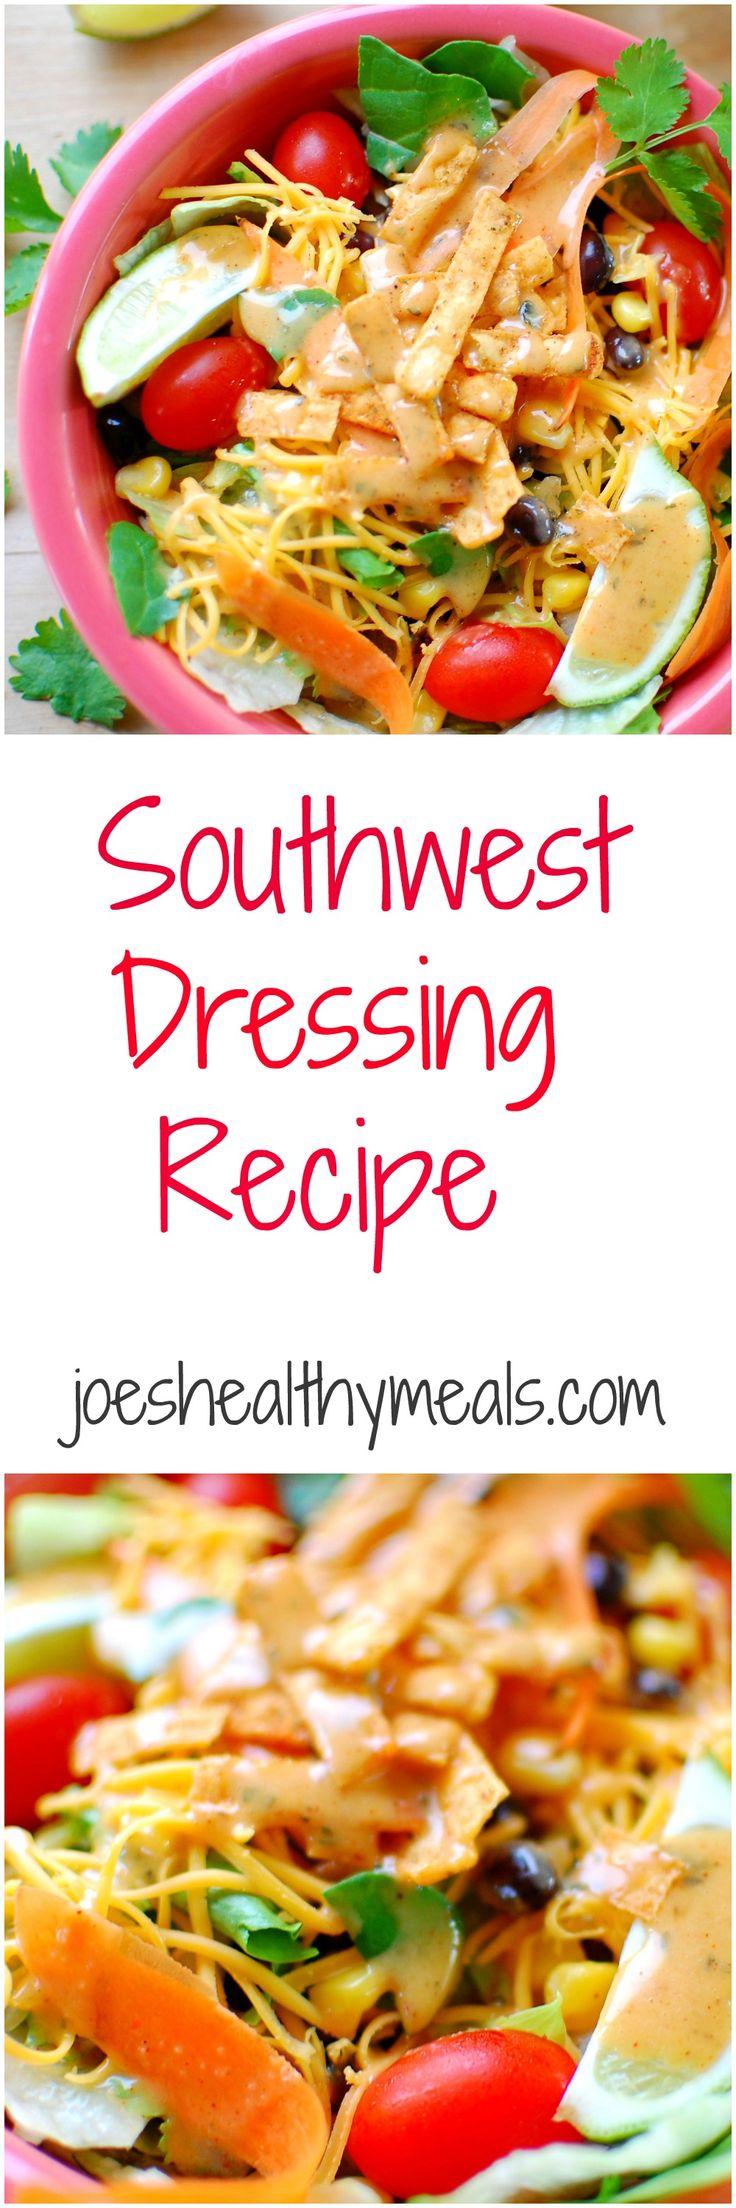 southwest dressing recipe. Southwest dressing recipe just like Newman's Own from McDonald's! This recipe tastes sooo good! | joeshealthymeals.com